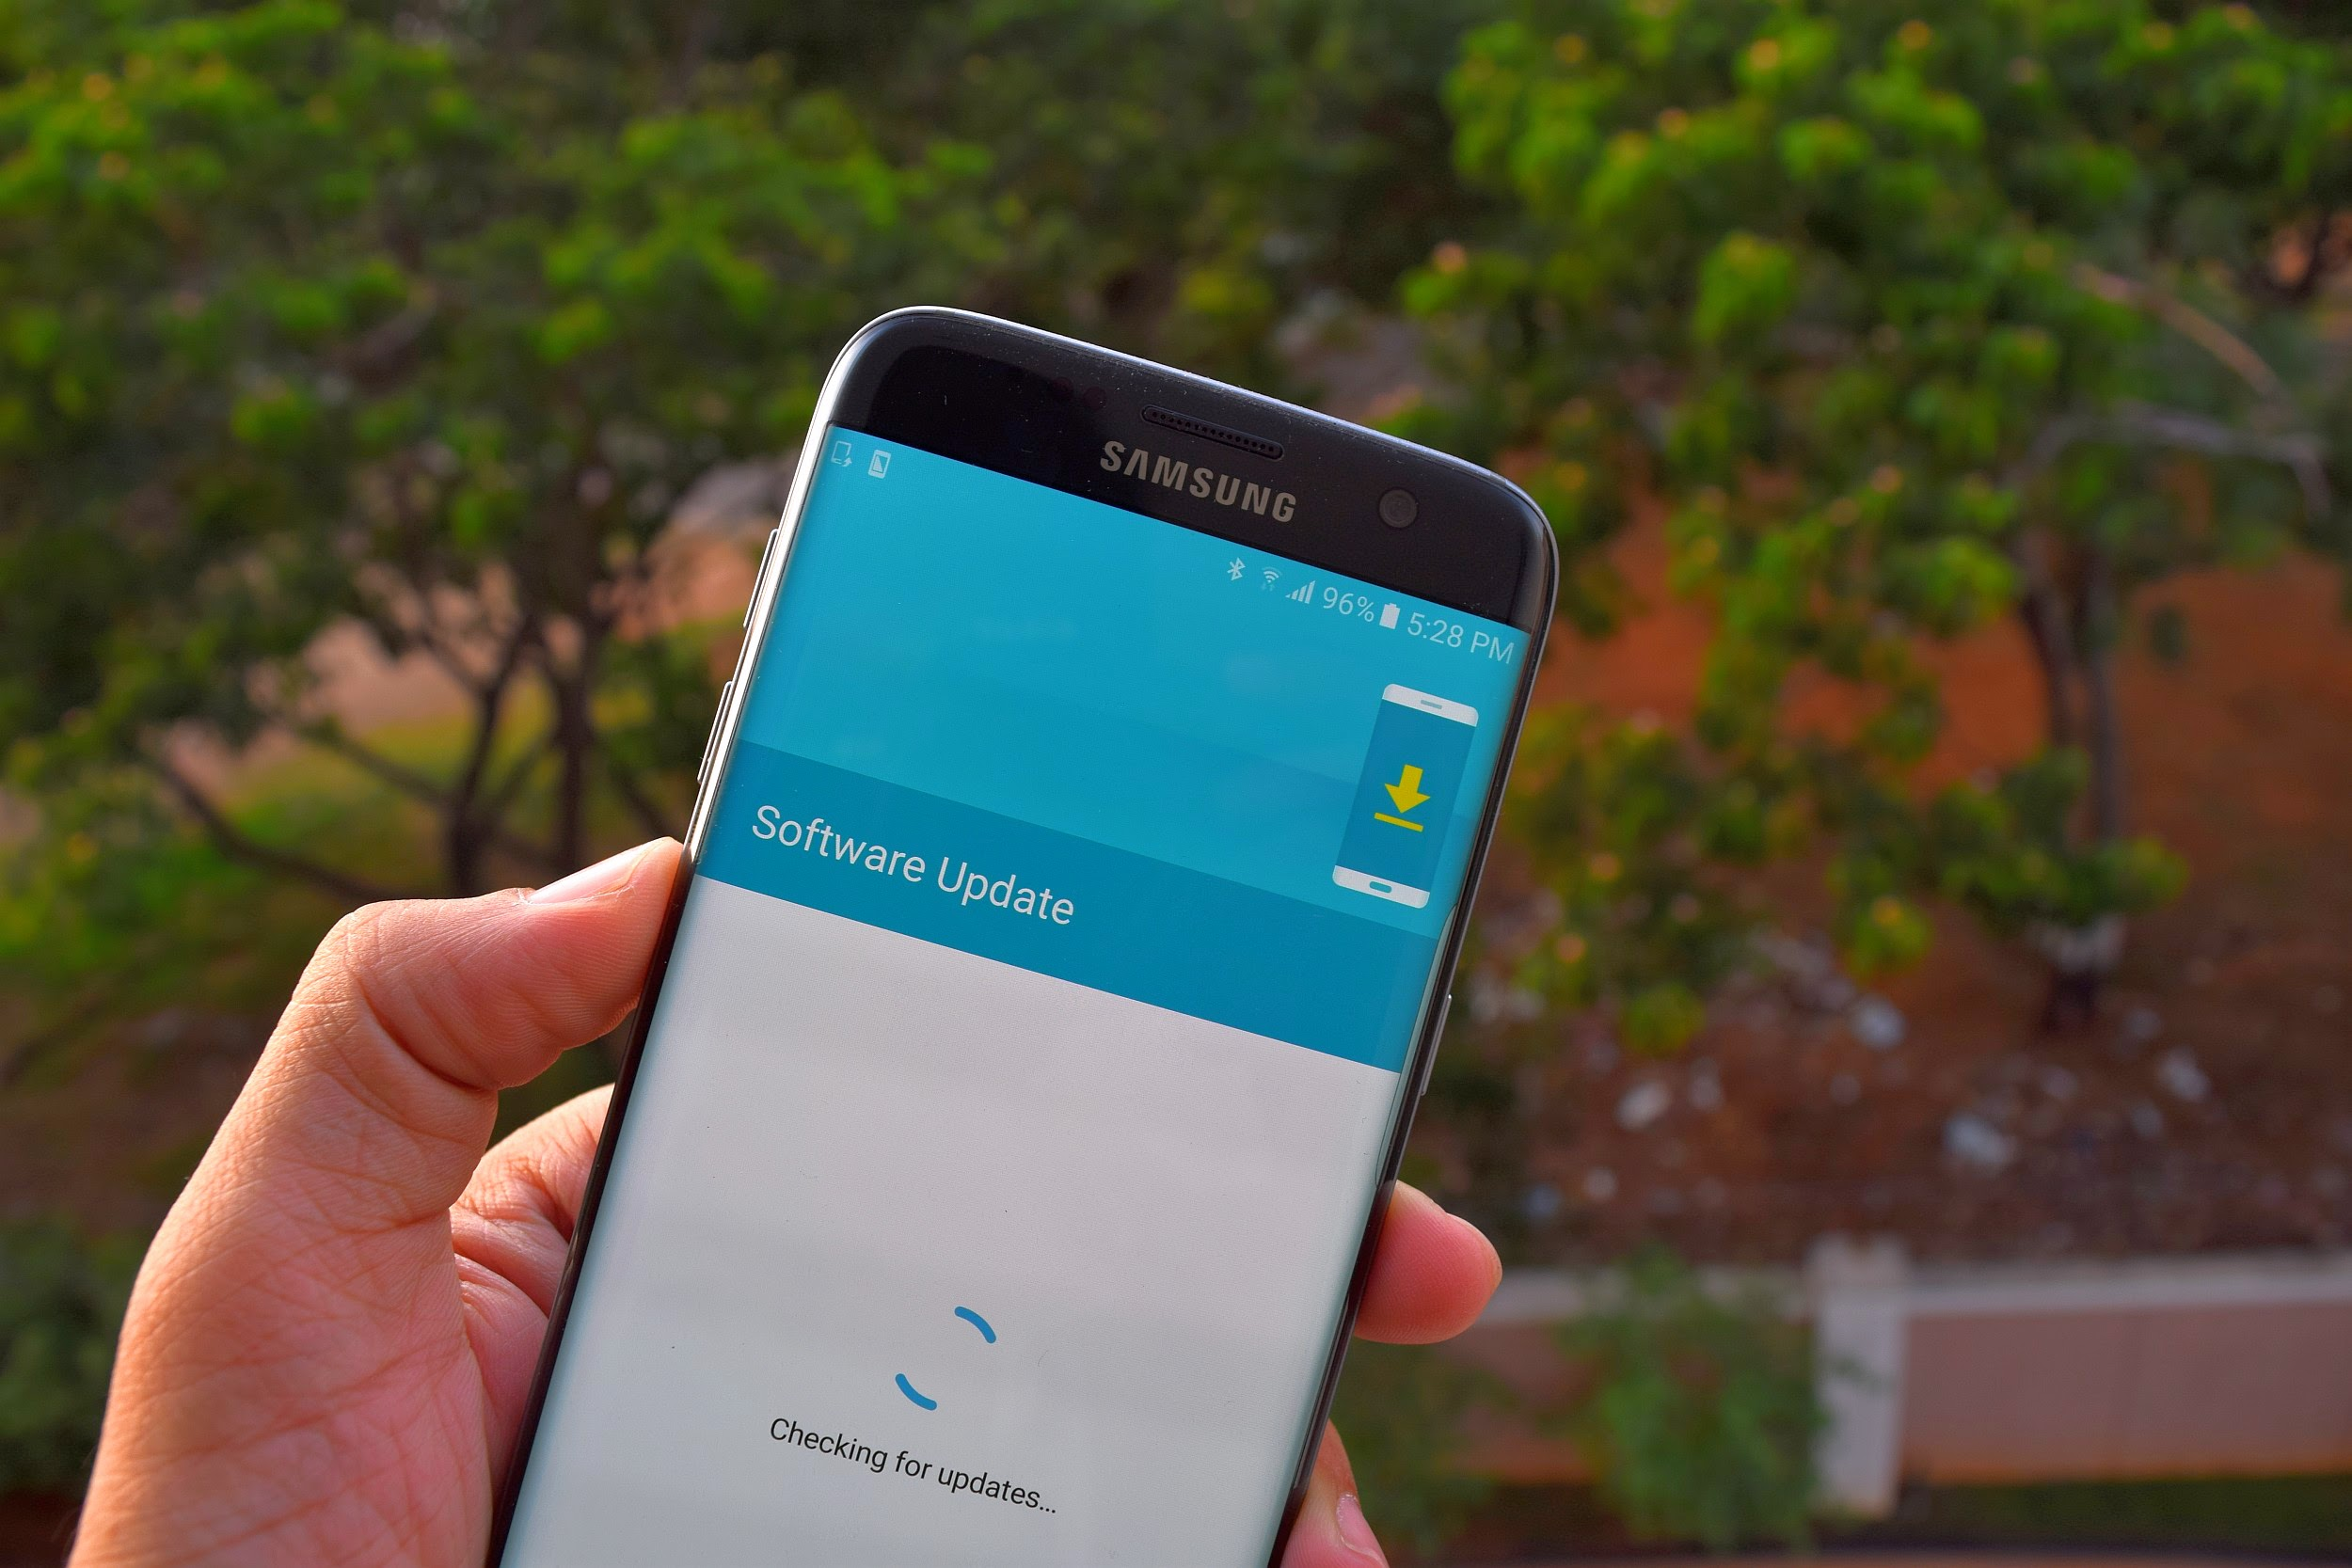 6-2-2016 Firmware Updates: Galaxy S6 edge, Galaxy Note Edge, Galaxy